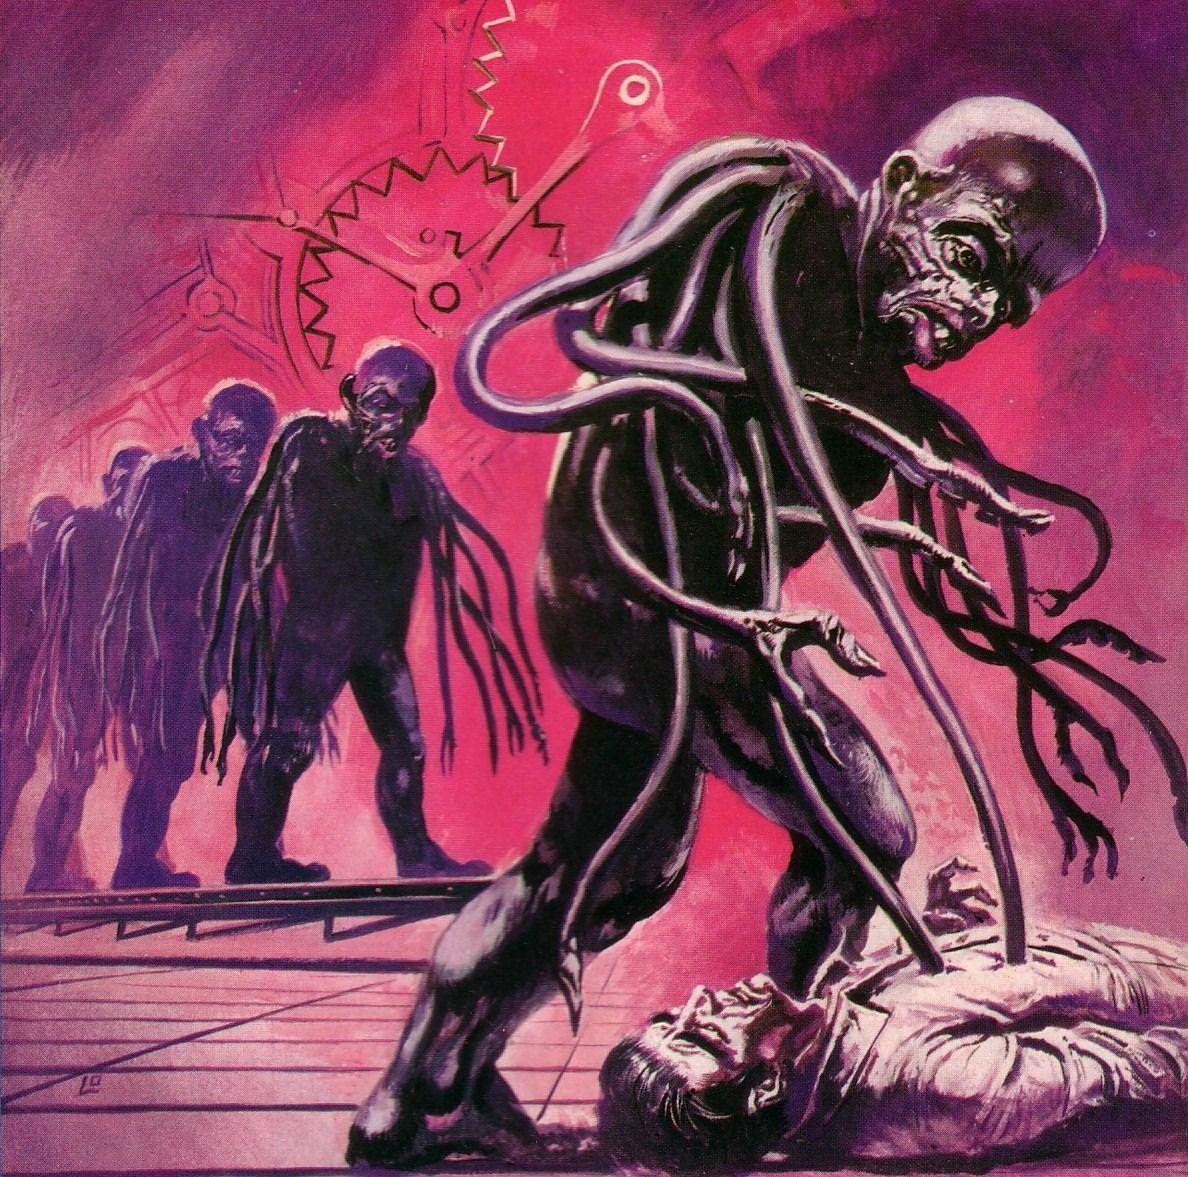 Book Cover Art, Old Comic Books, 70s Sci